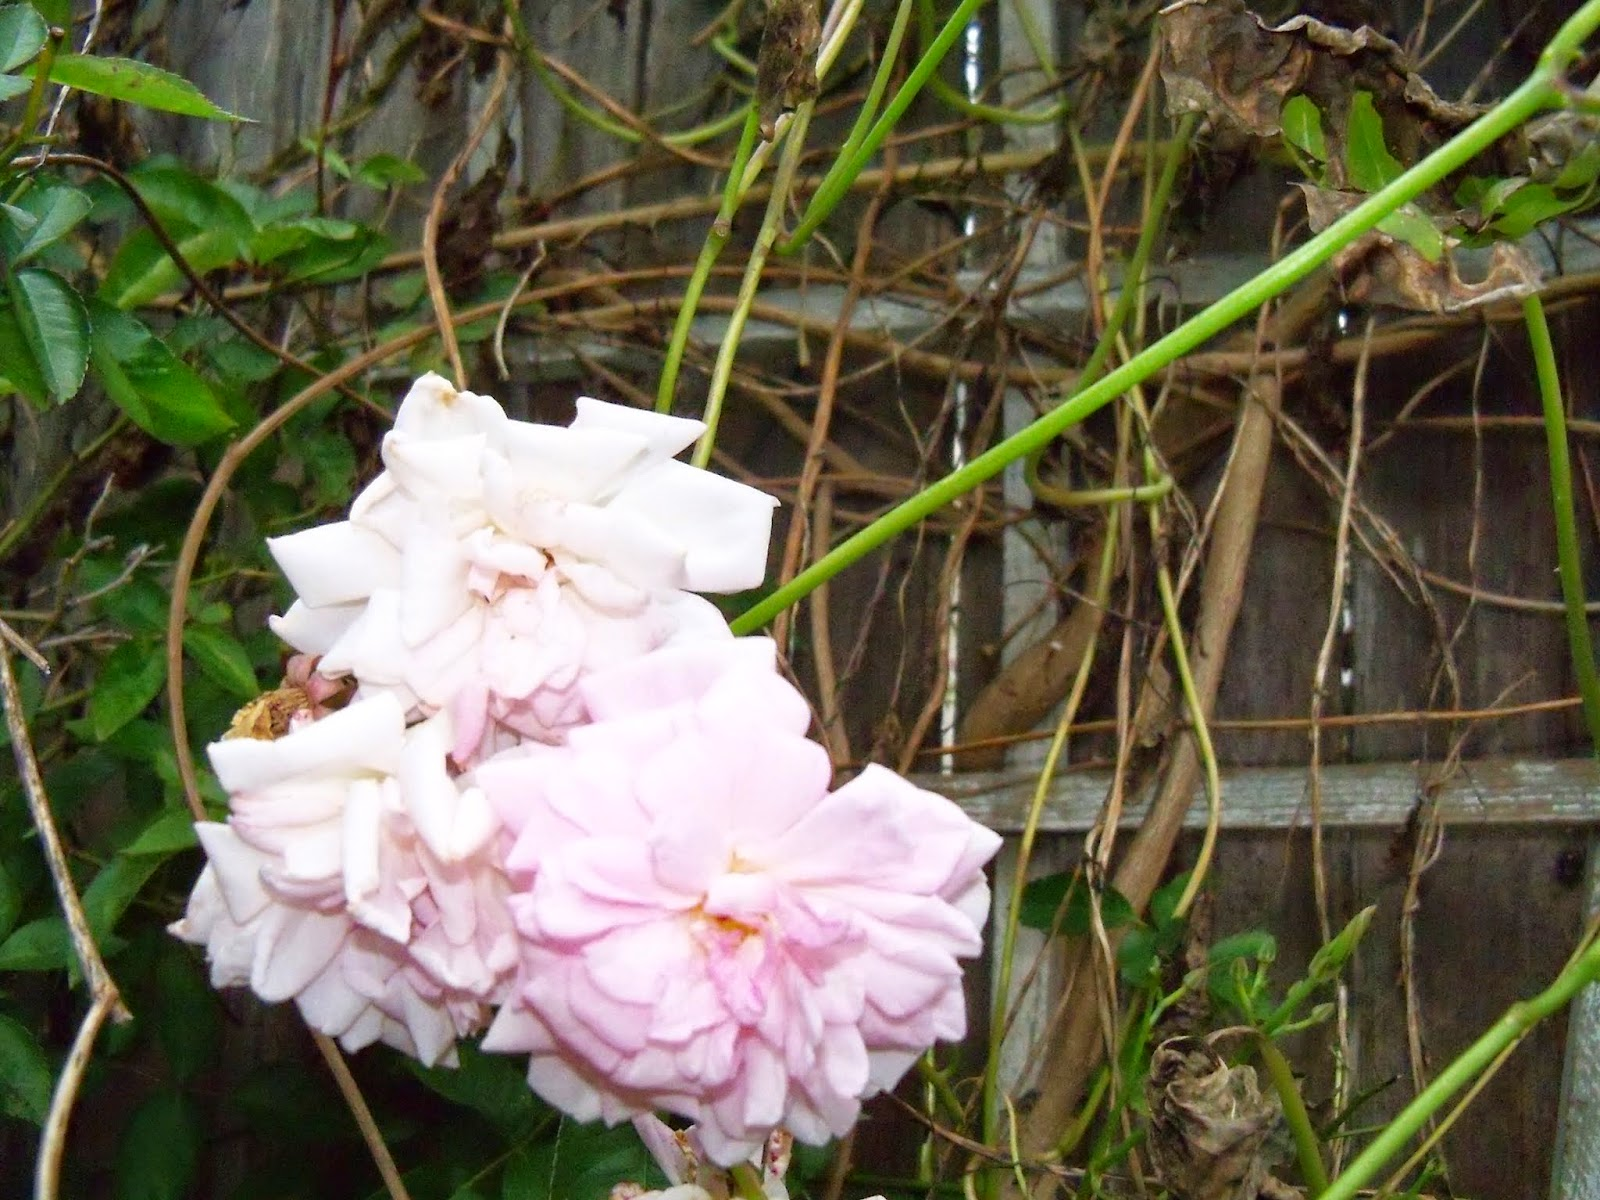 Gardening 2014 - 116_6269.JPG